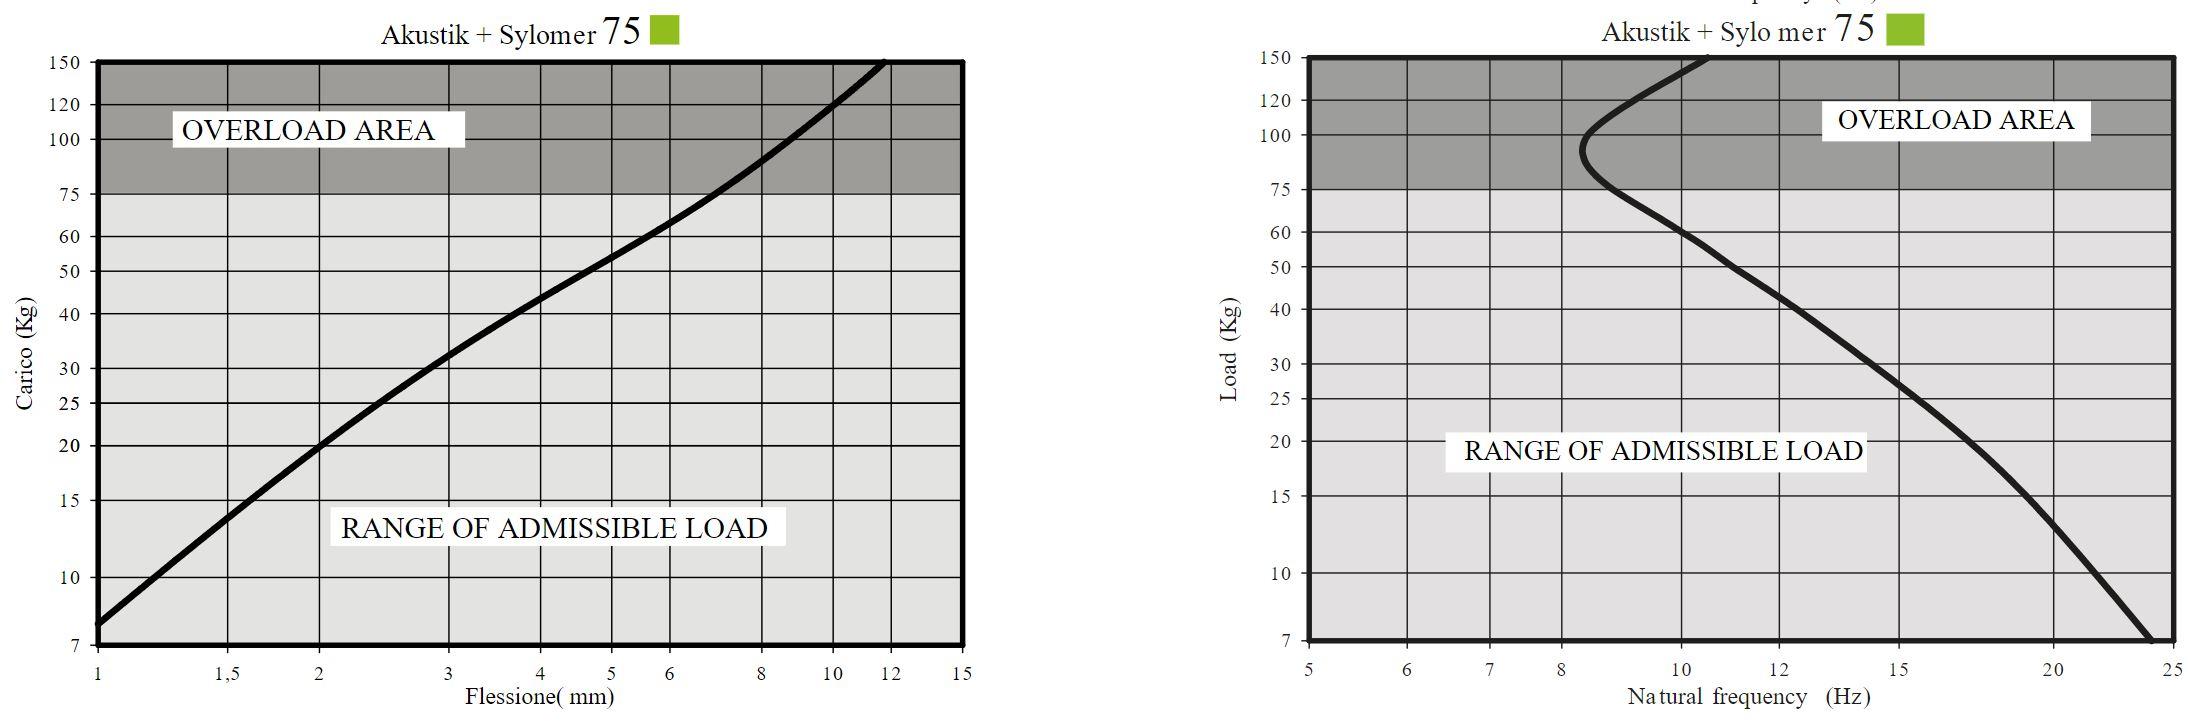 Akustik 4 + sylomer curve 2